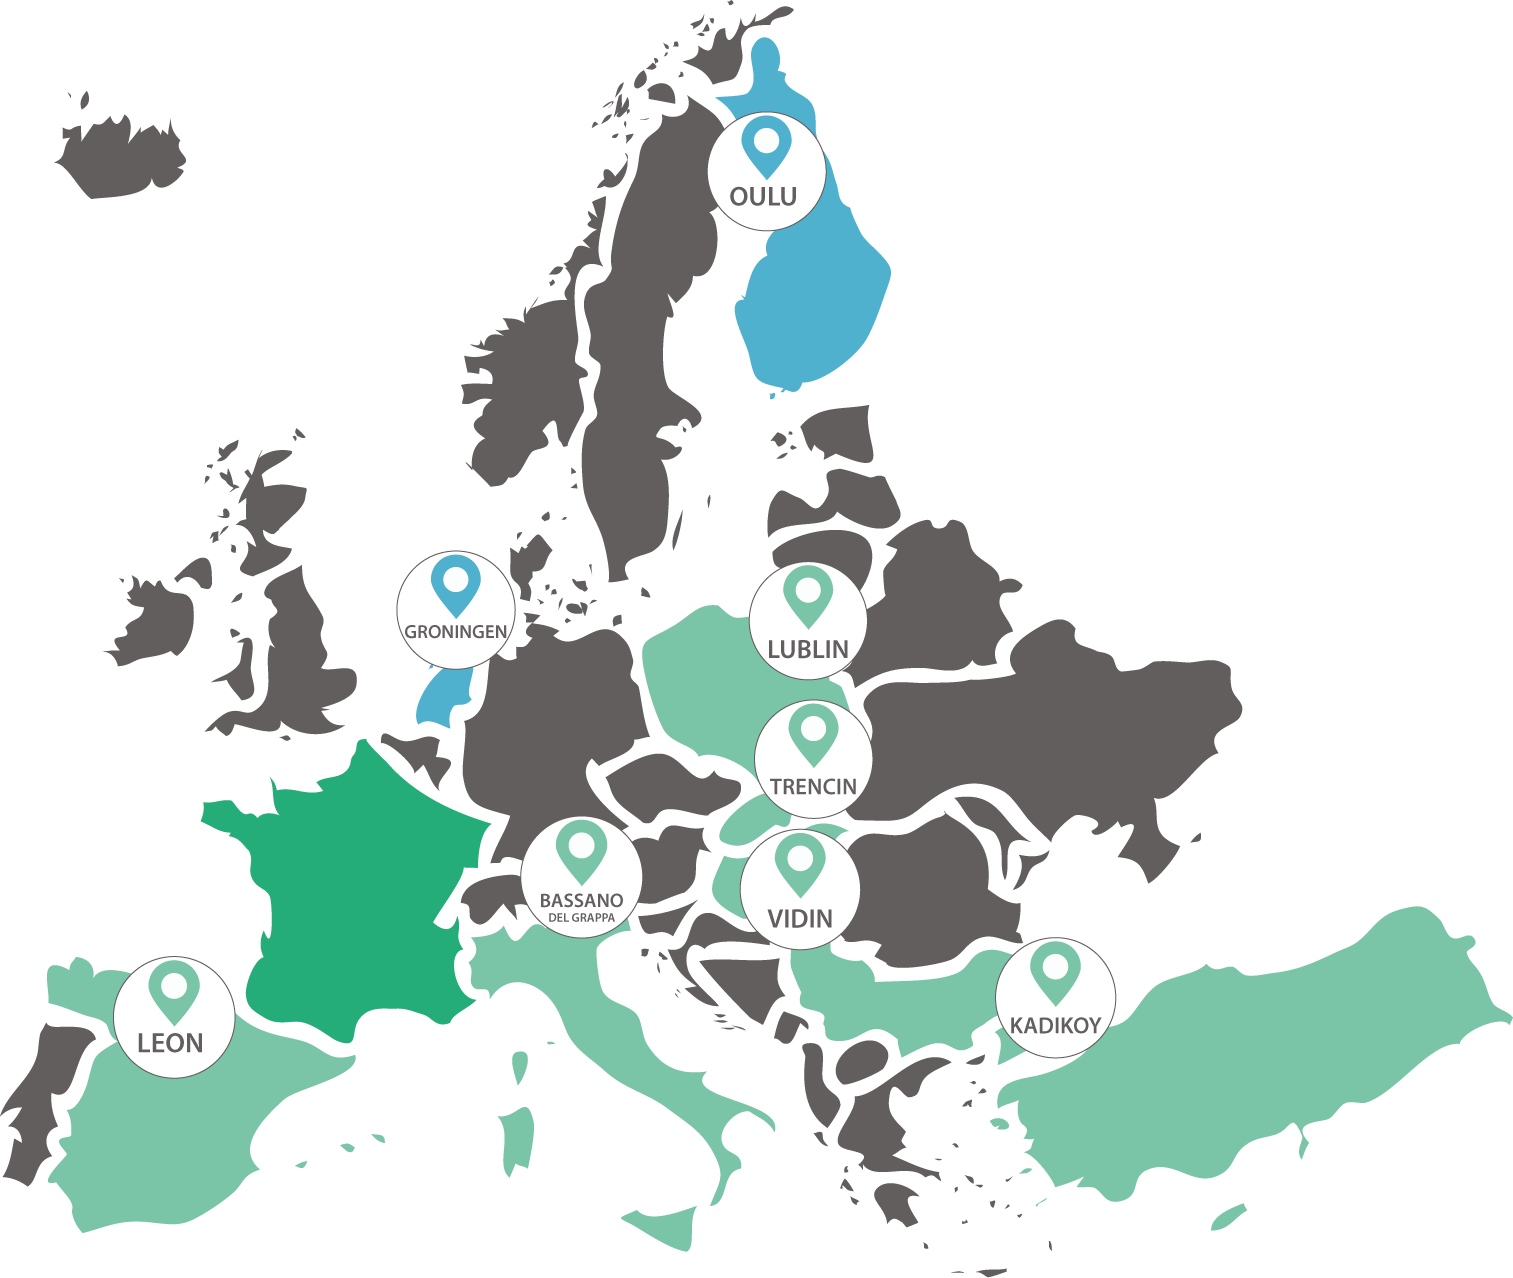 MAKING CITY map Europe - V3